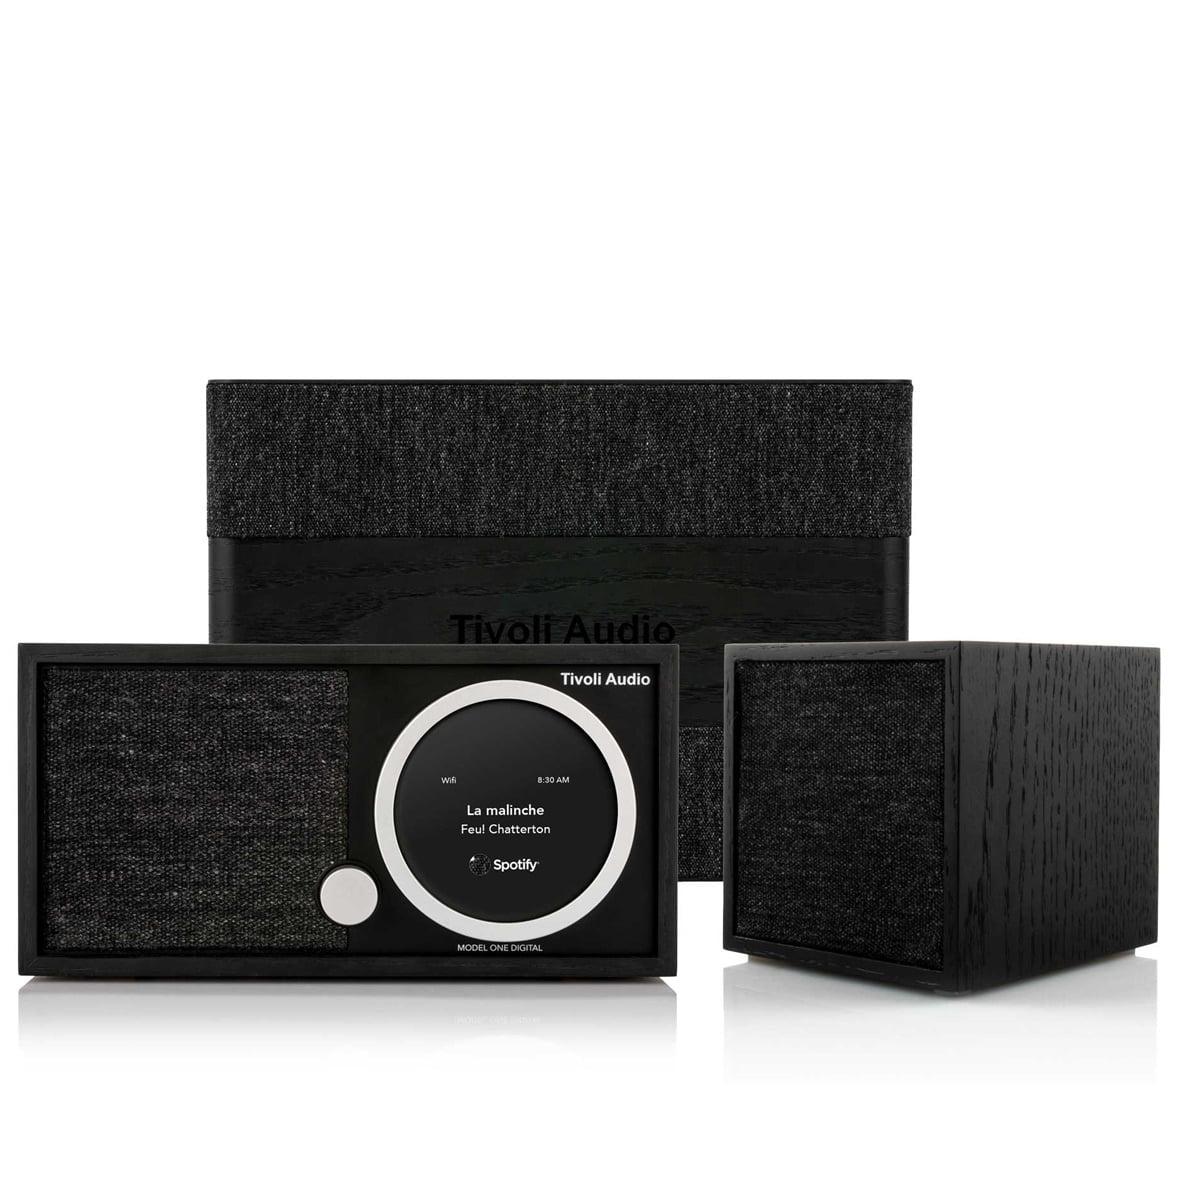 Tivoli Audio Model One Digital FM Wi-Fi Bluetooth Radio with CUBE Wireless Speaker and ART Model Sub Wi-Fi Subwoofer by Tivoli Audio